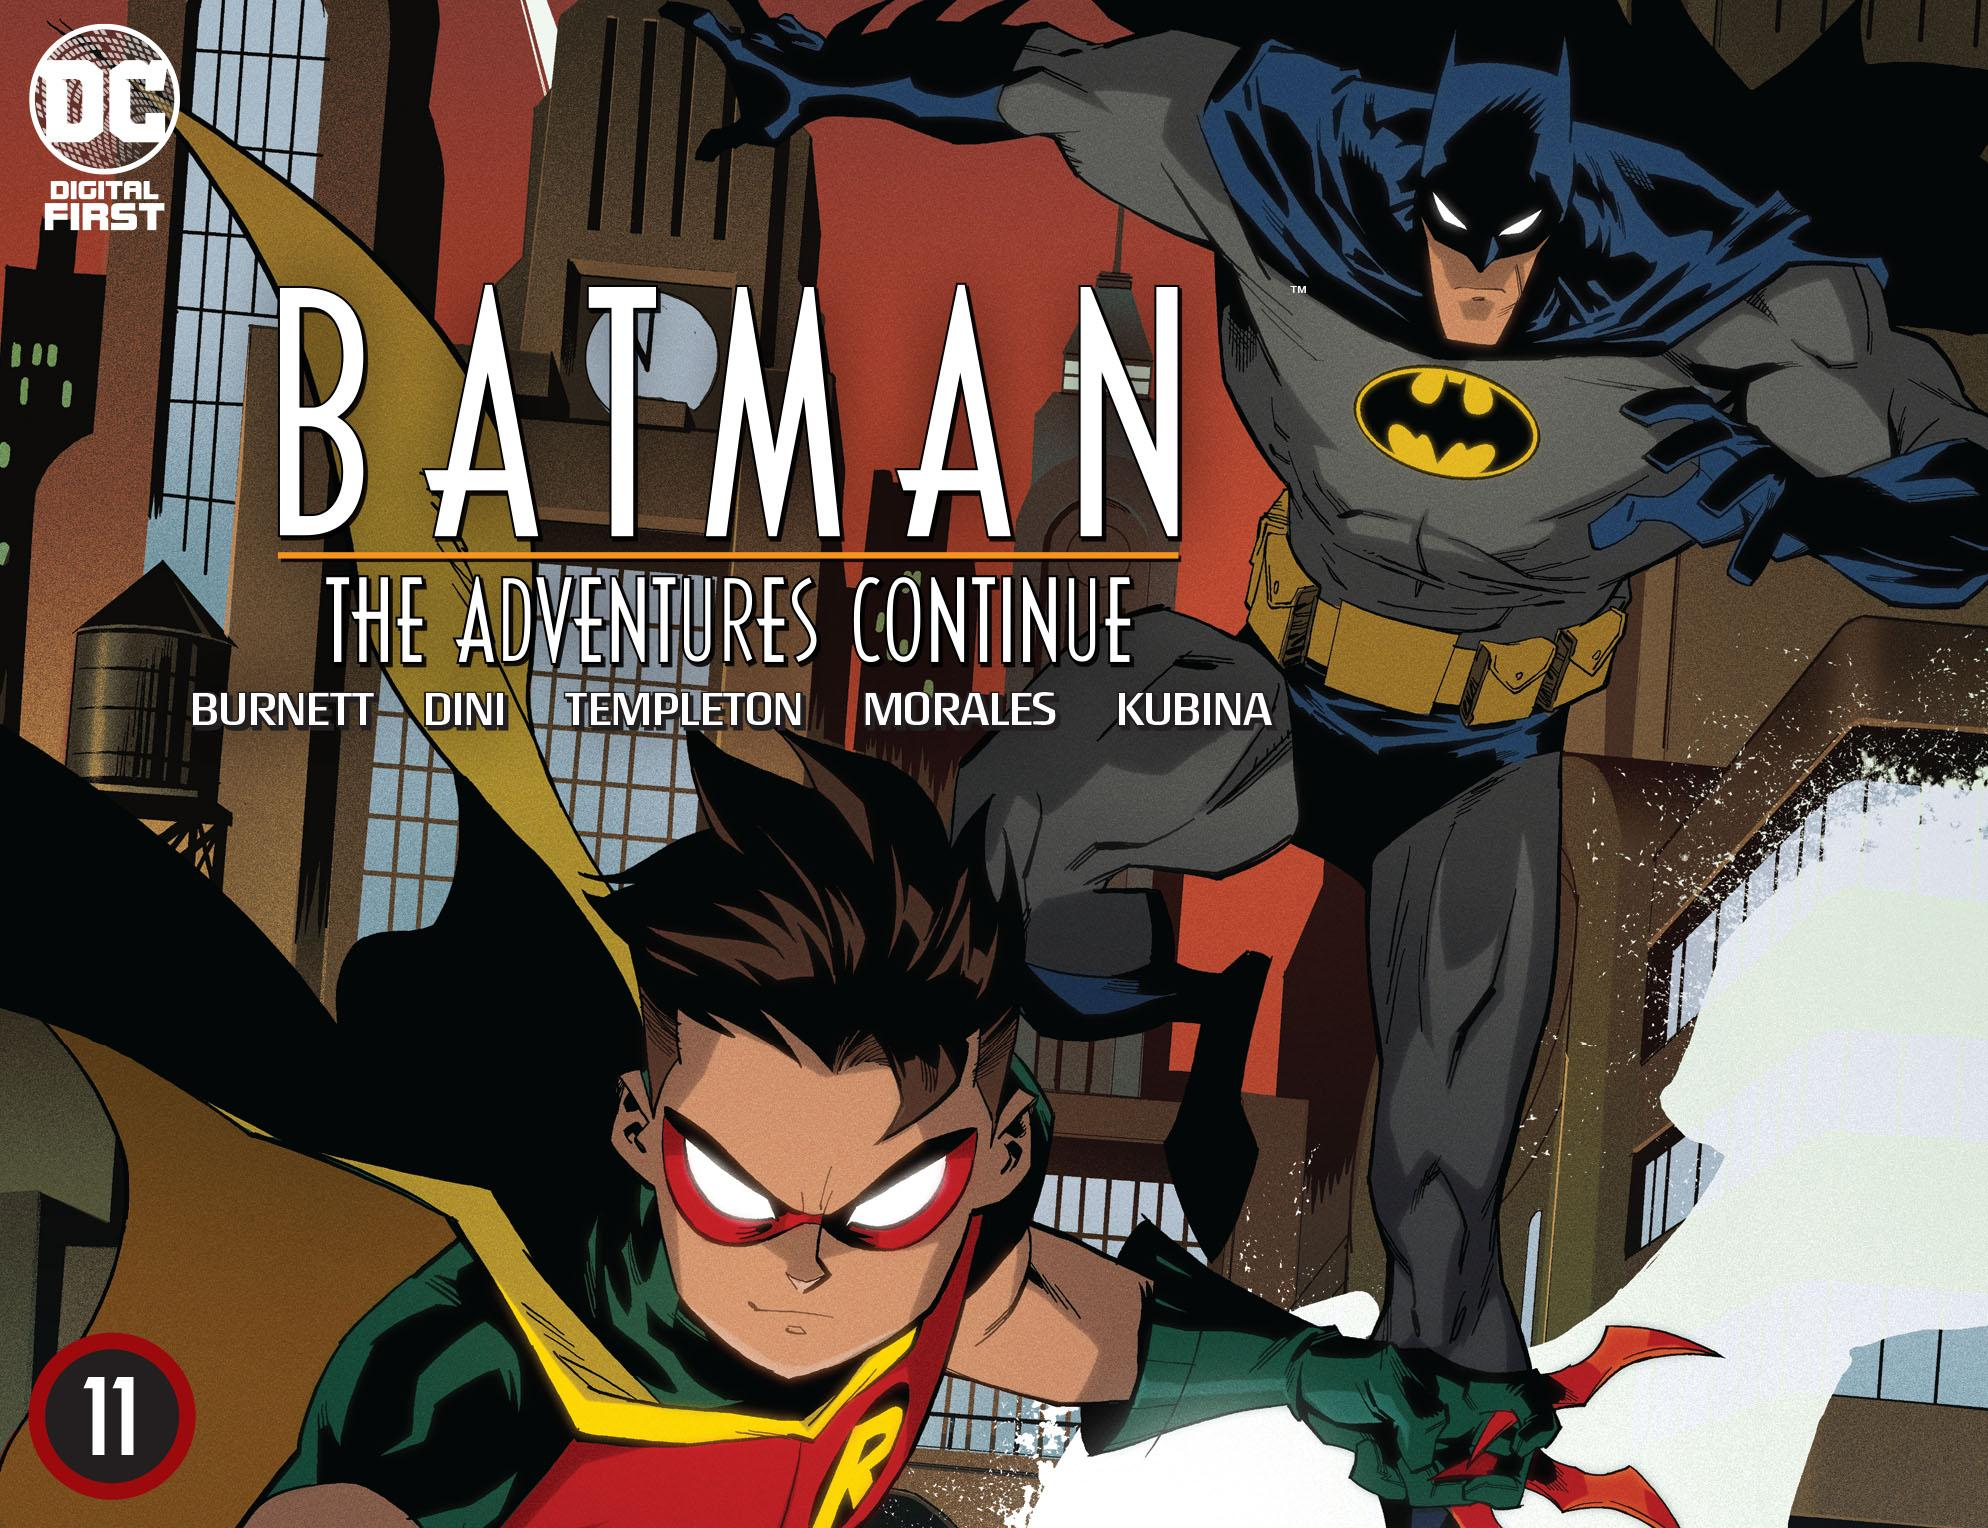 Batman-The Adventures Continue 011 2020 Digital F Zone